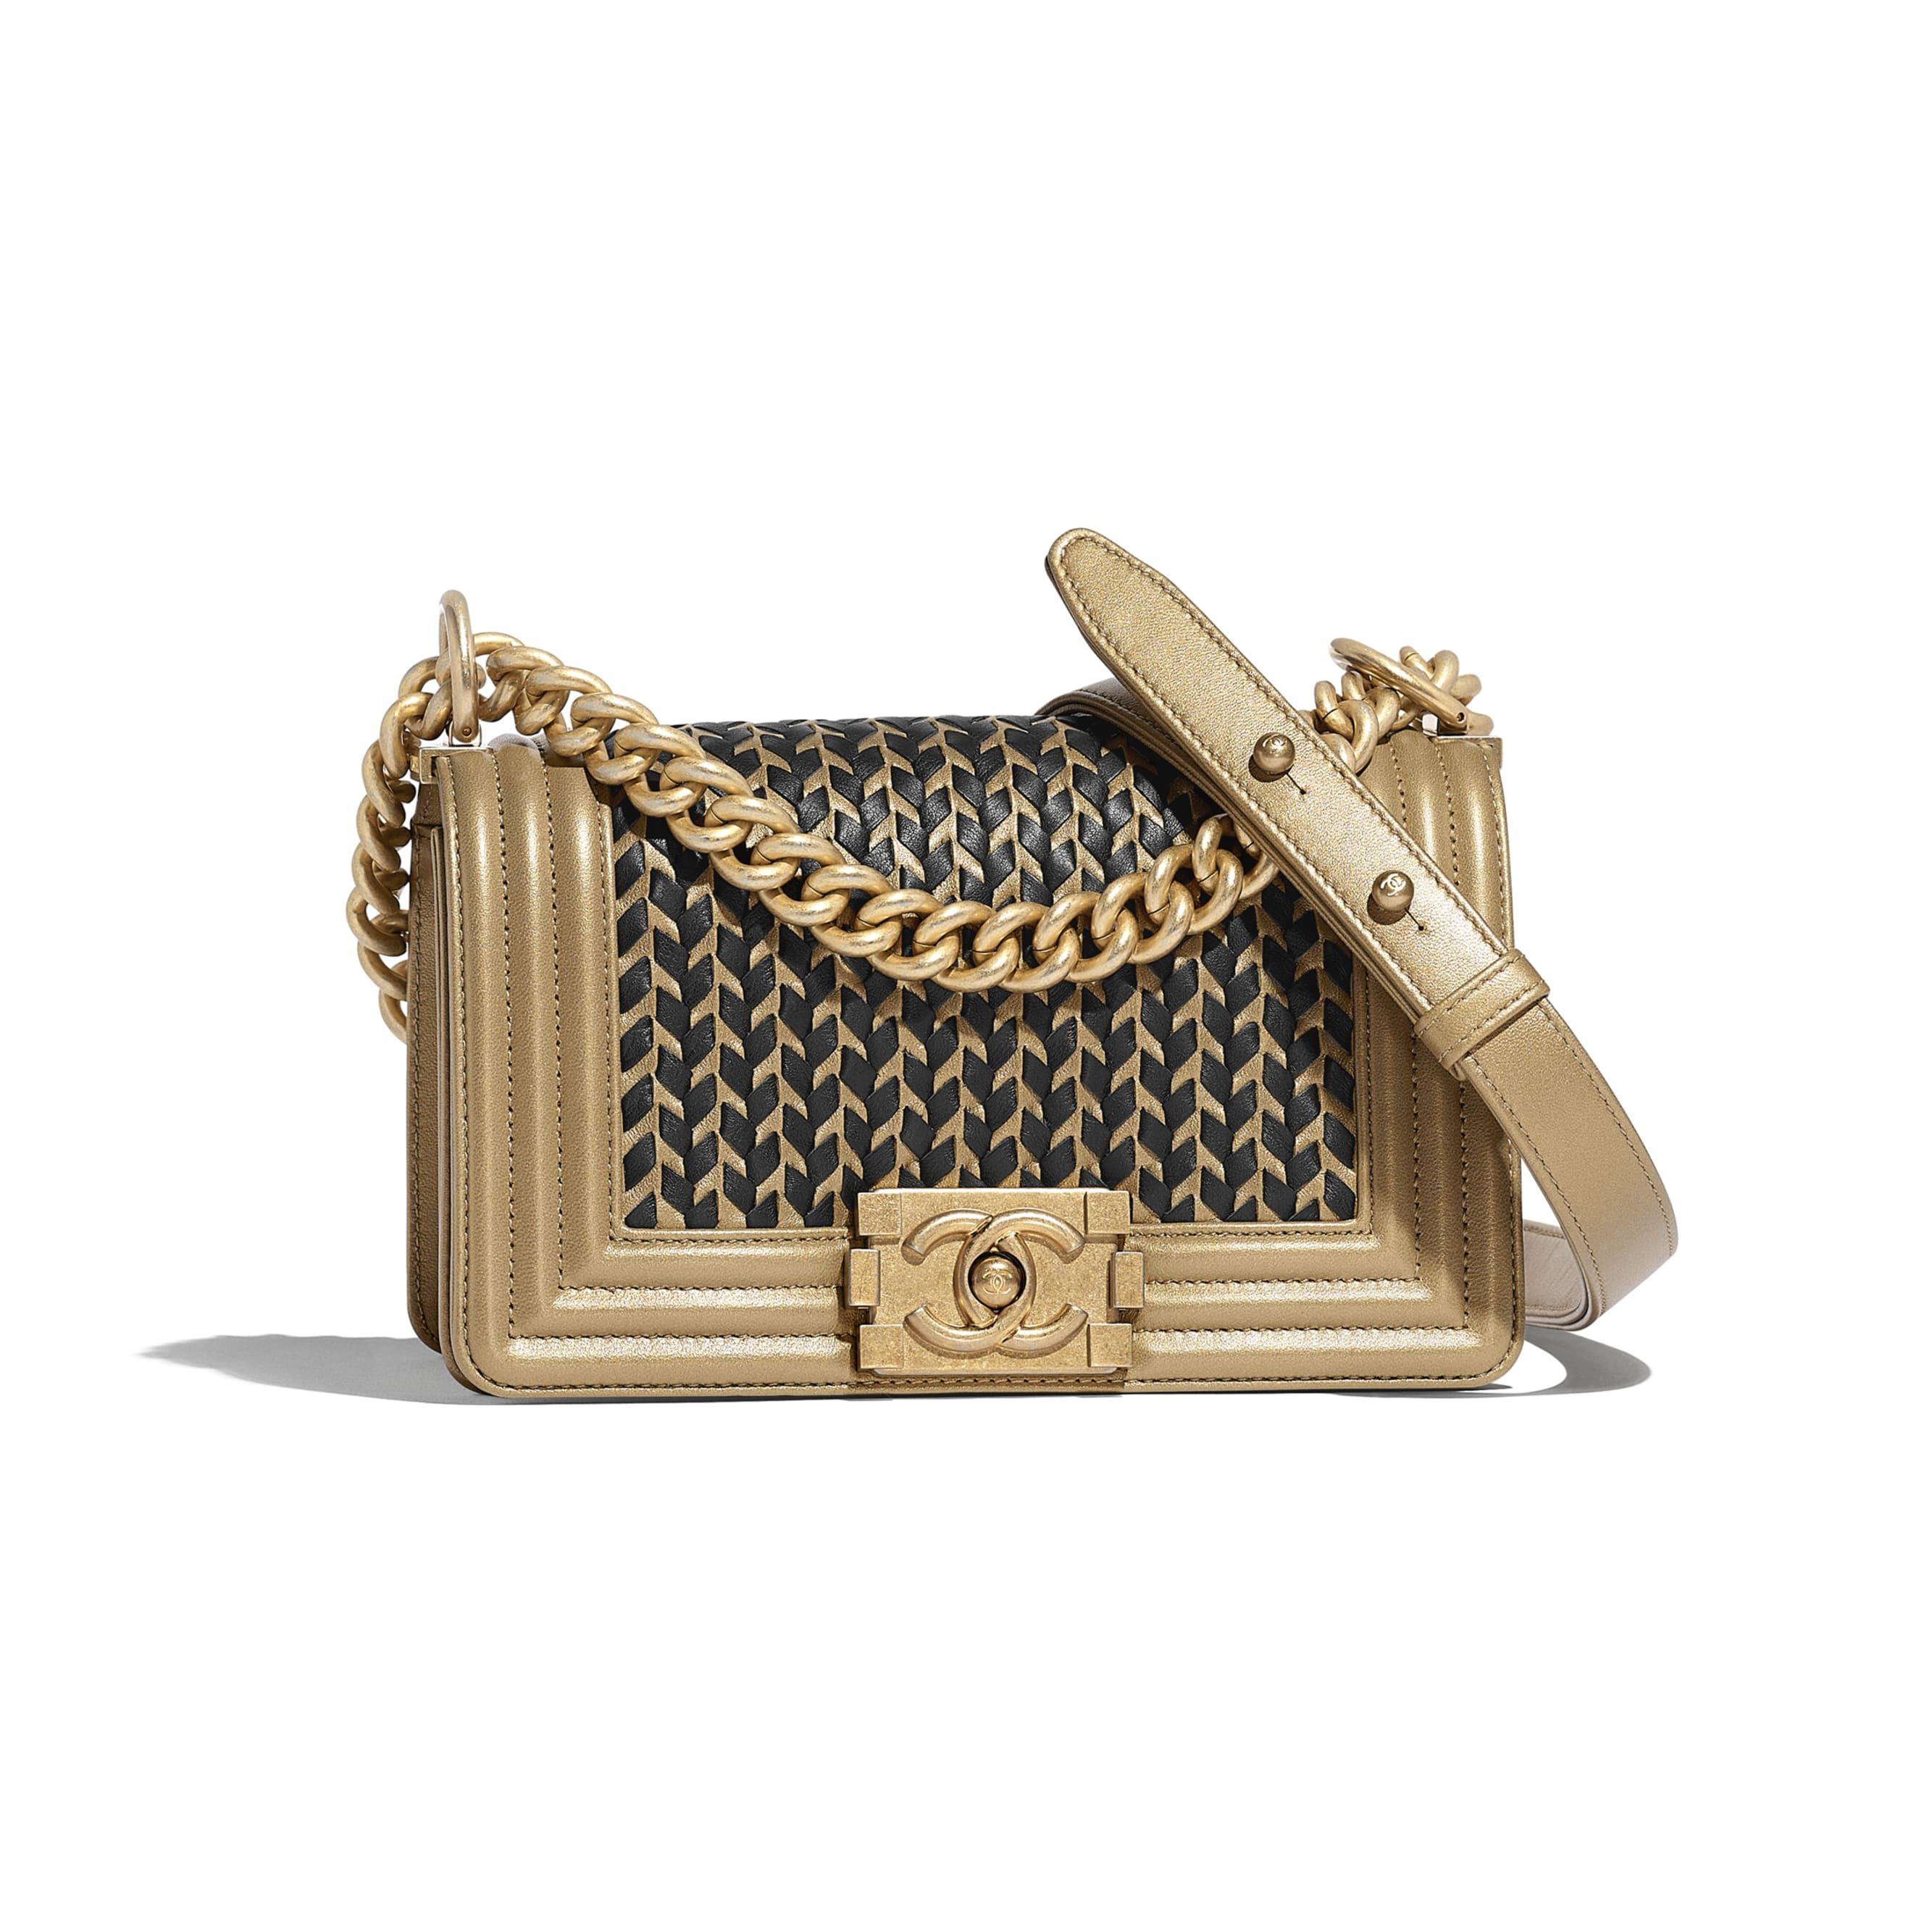 Small BOY CHANEL Handbag - Gold & Black - Metallic Lambskin & Gold Metal - CHANEL - Default view - see standard sized version